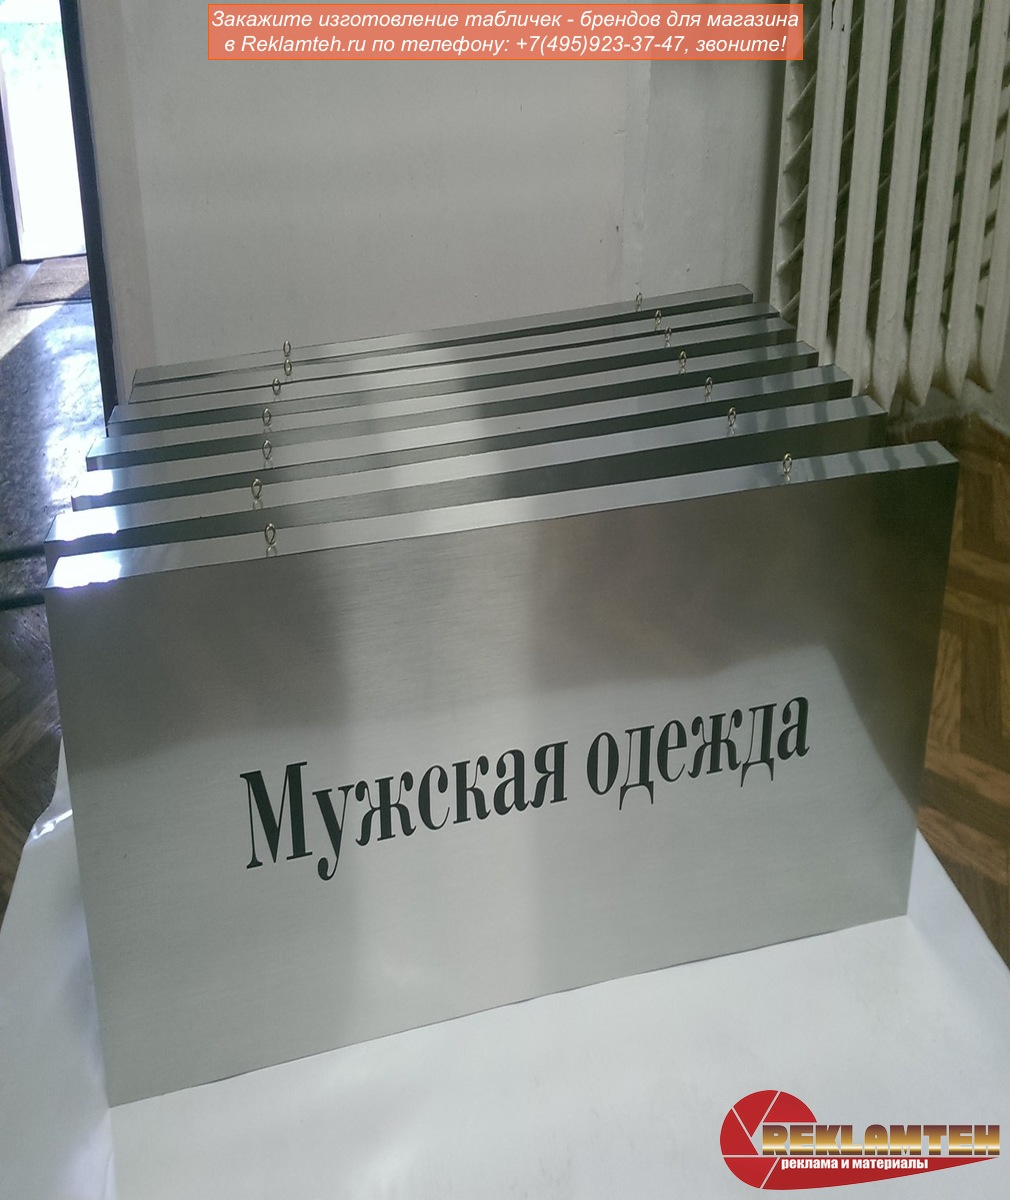 "Tablichki brendy 1 - Табличка ""Бренды"" для товаров"